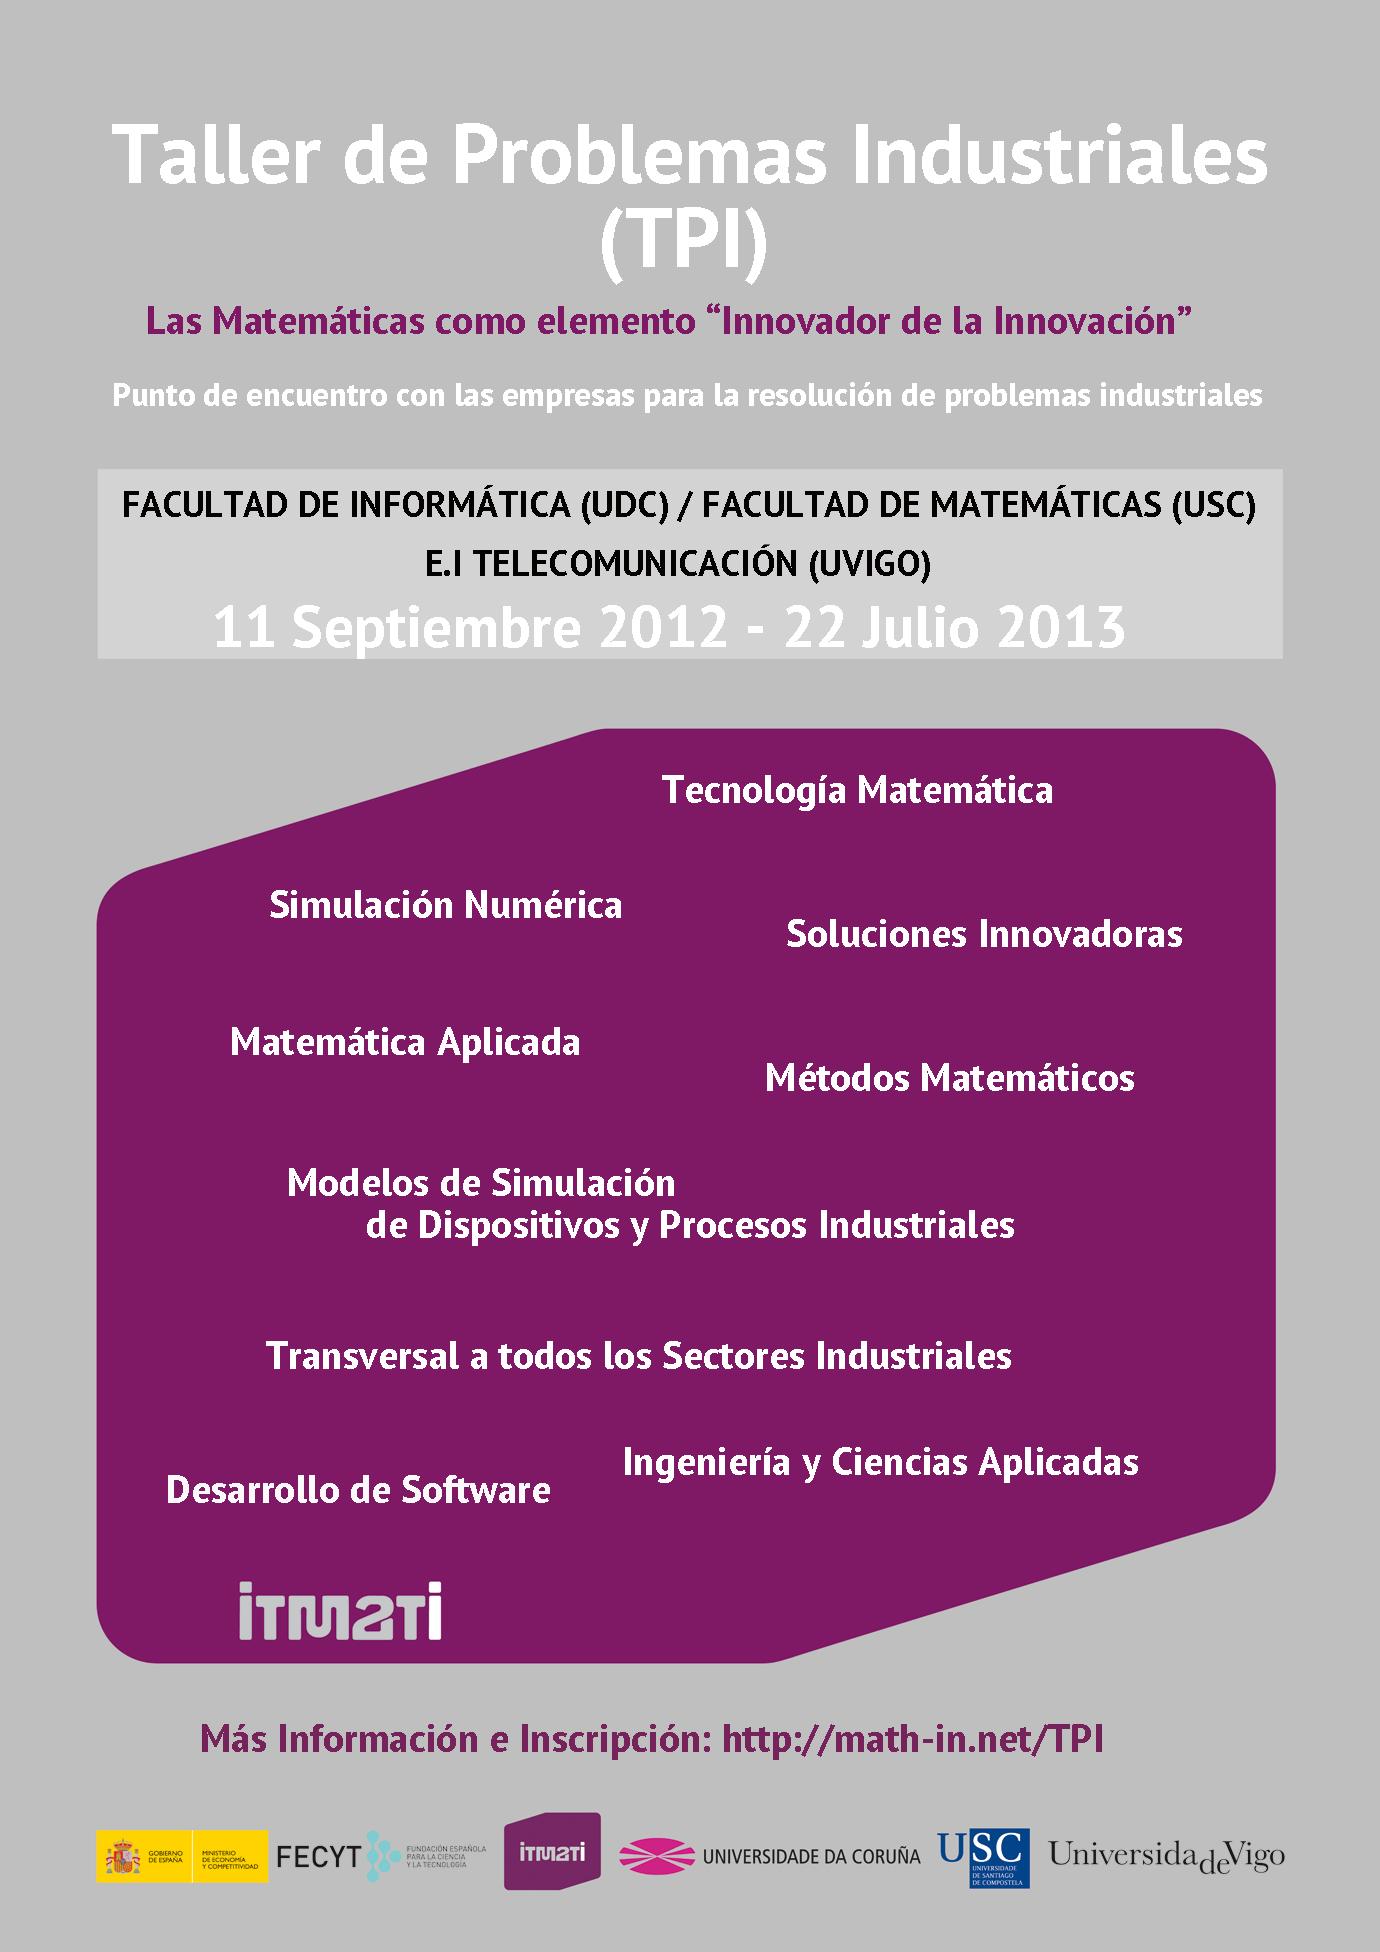 Taller Industrial Matematicas Industria